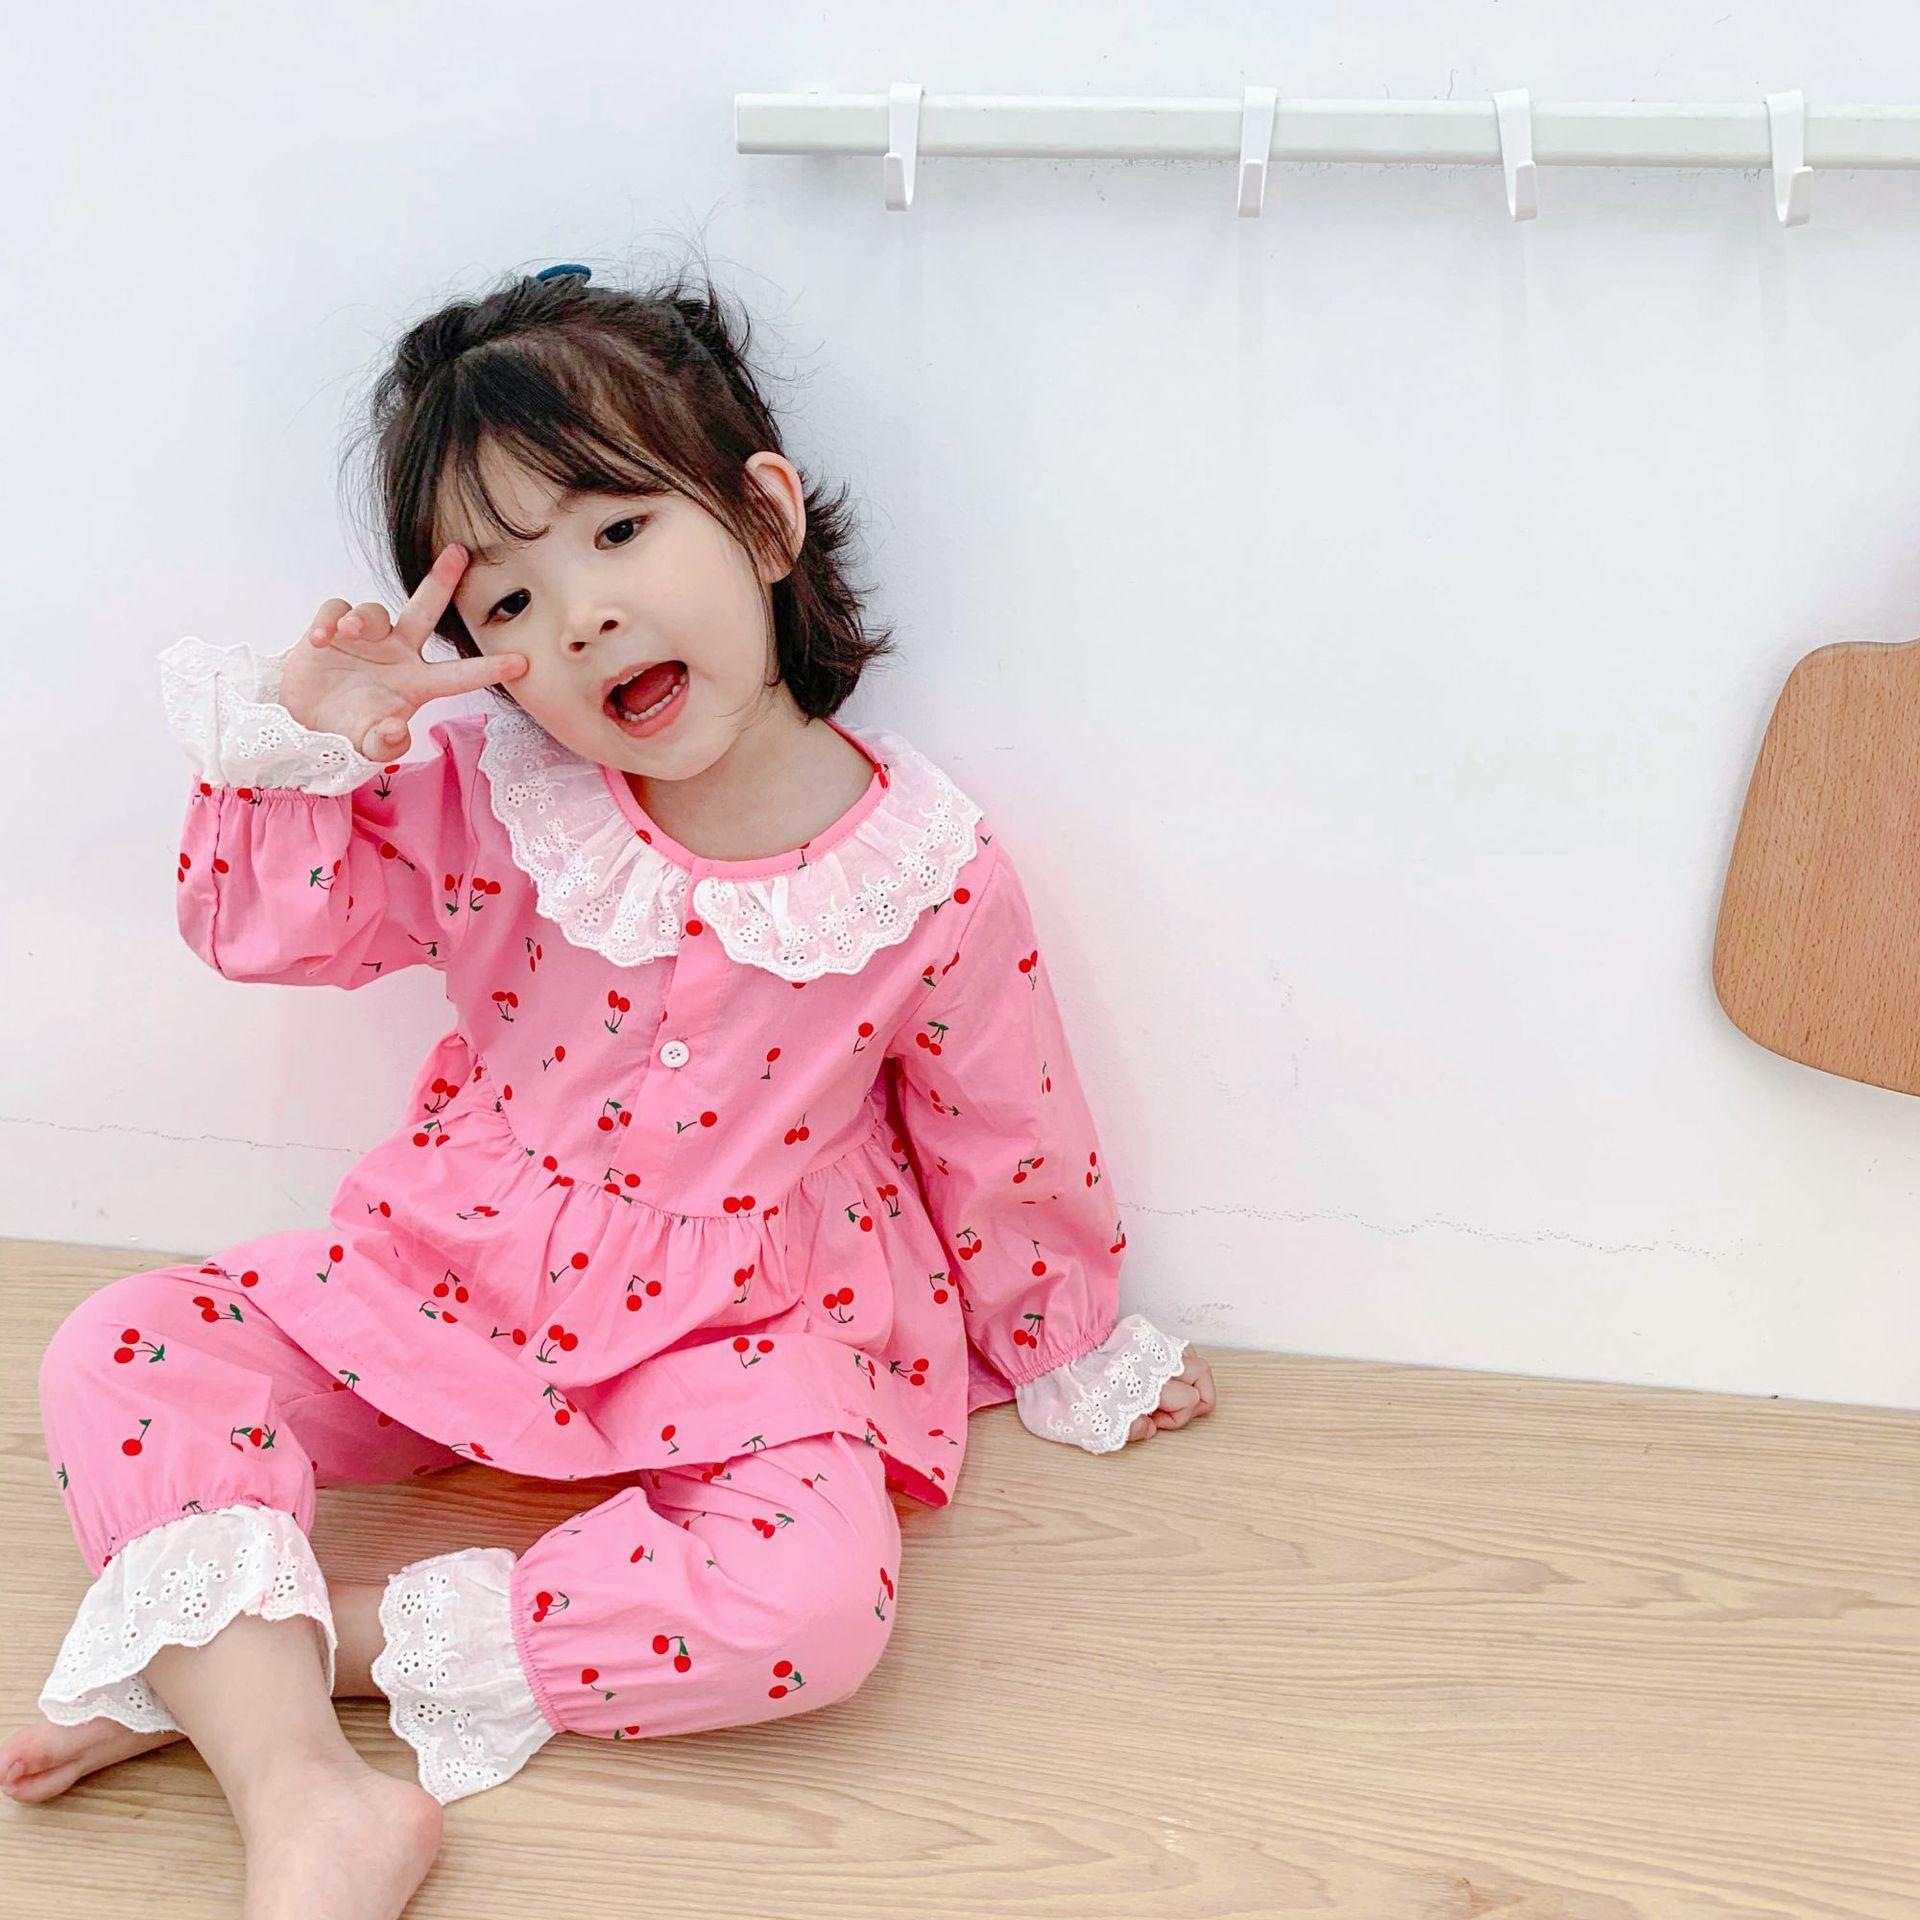 Childrenswear 2019 Autumn Girls Cute Cherry Lace Tracksuit CHILDREN'S Pants Long Sleeve Pajamas Suit